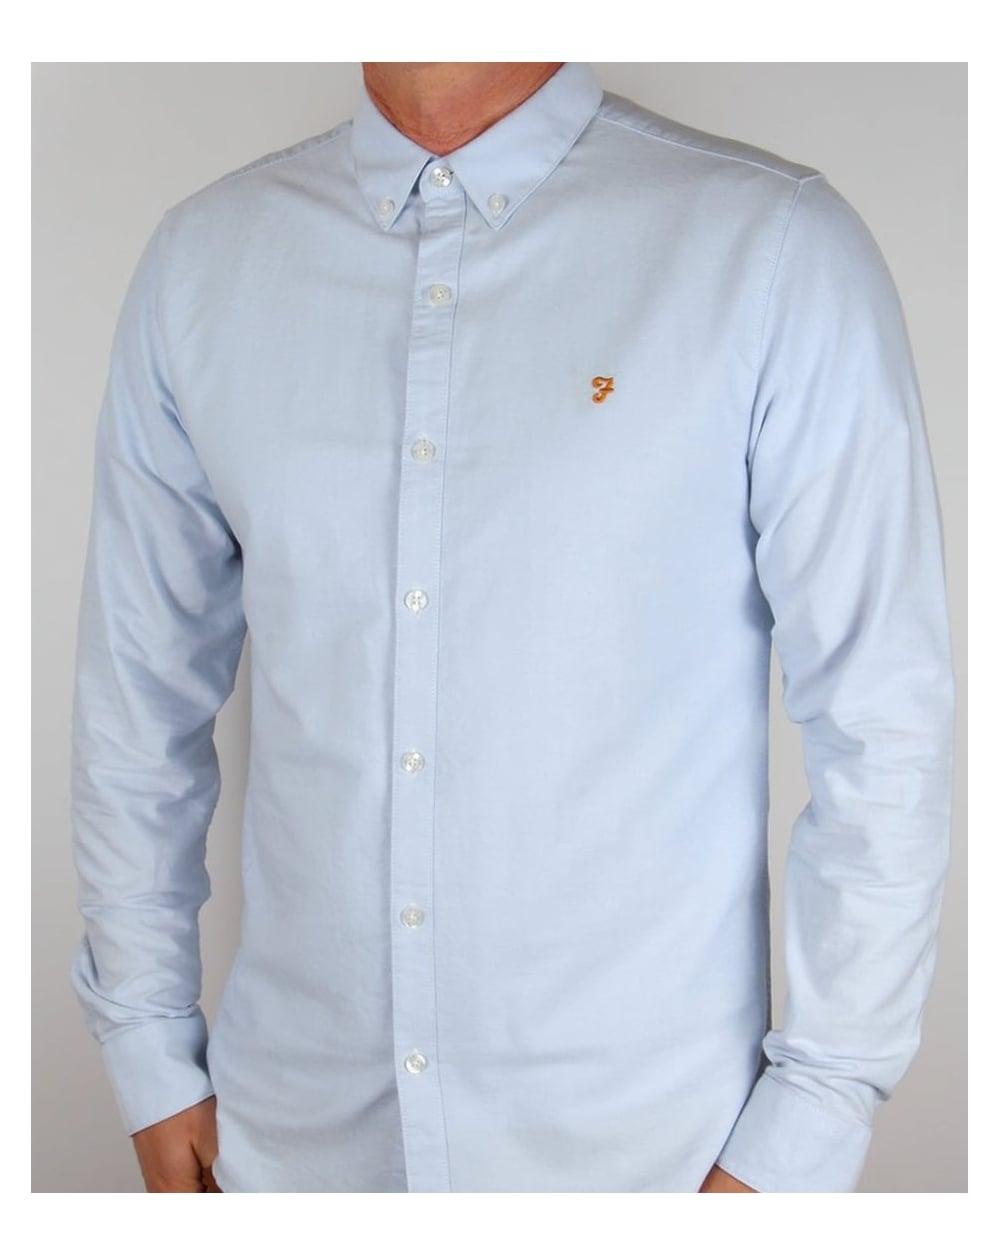 Farah Farah Brewer Shirt Sky Blue 17781766f